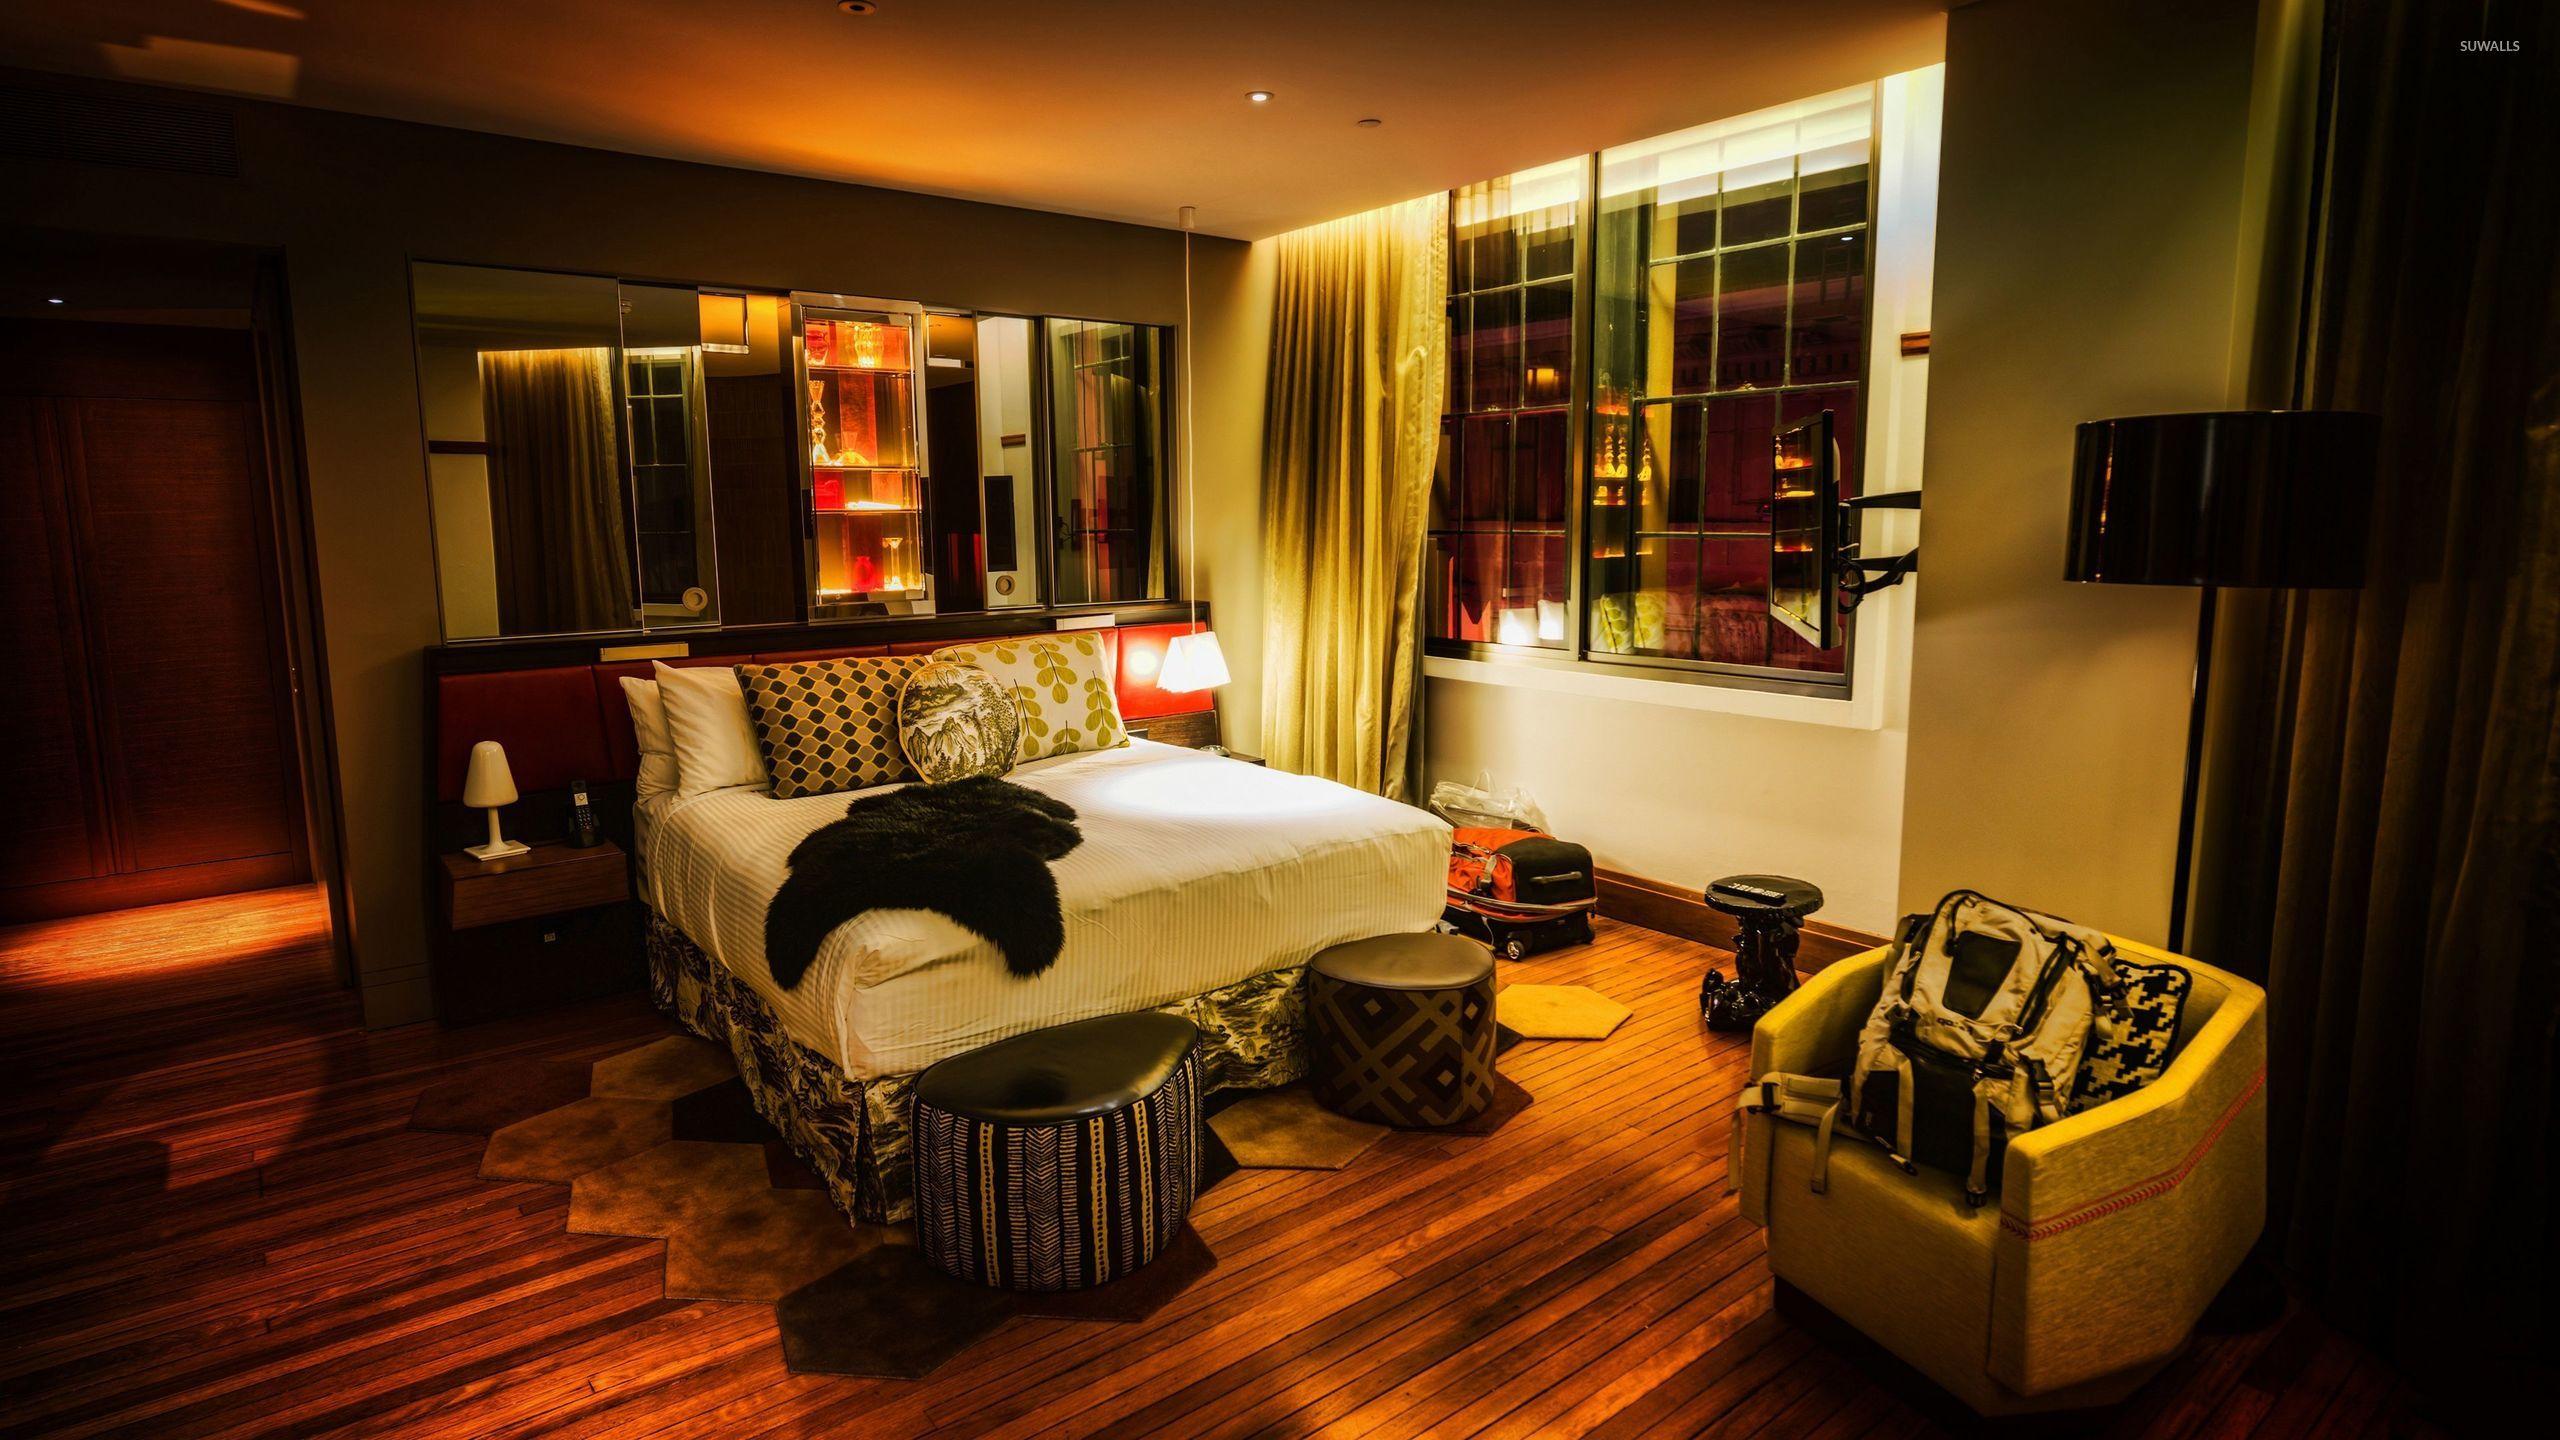 Cozy Bedroom 3 Wallpaper Photography Wallpapers 48257